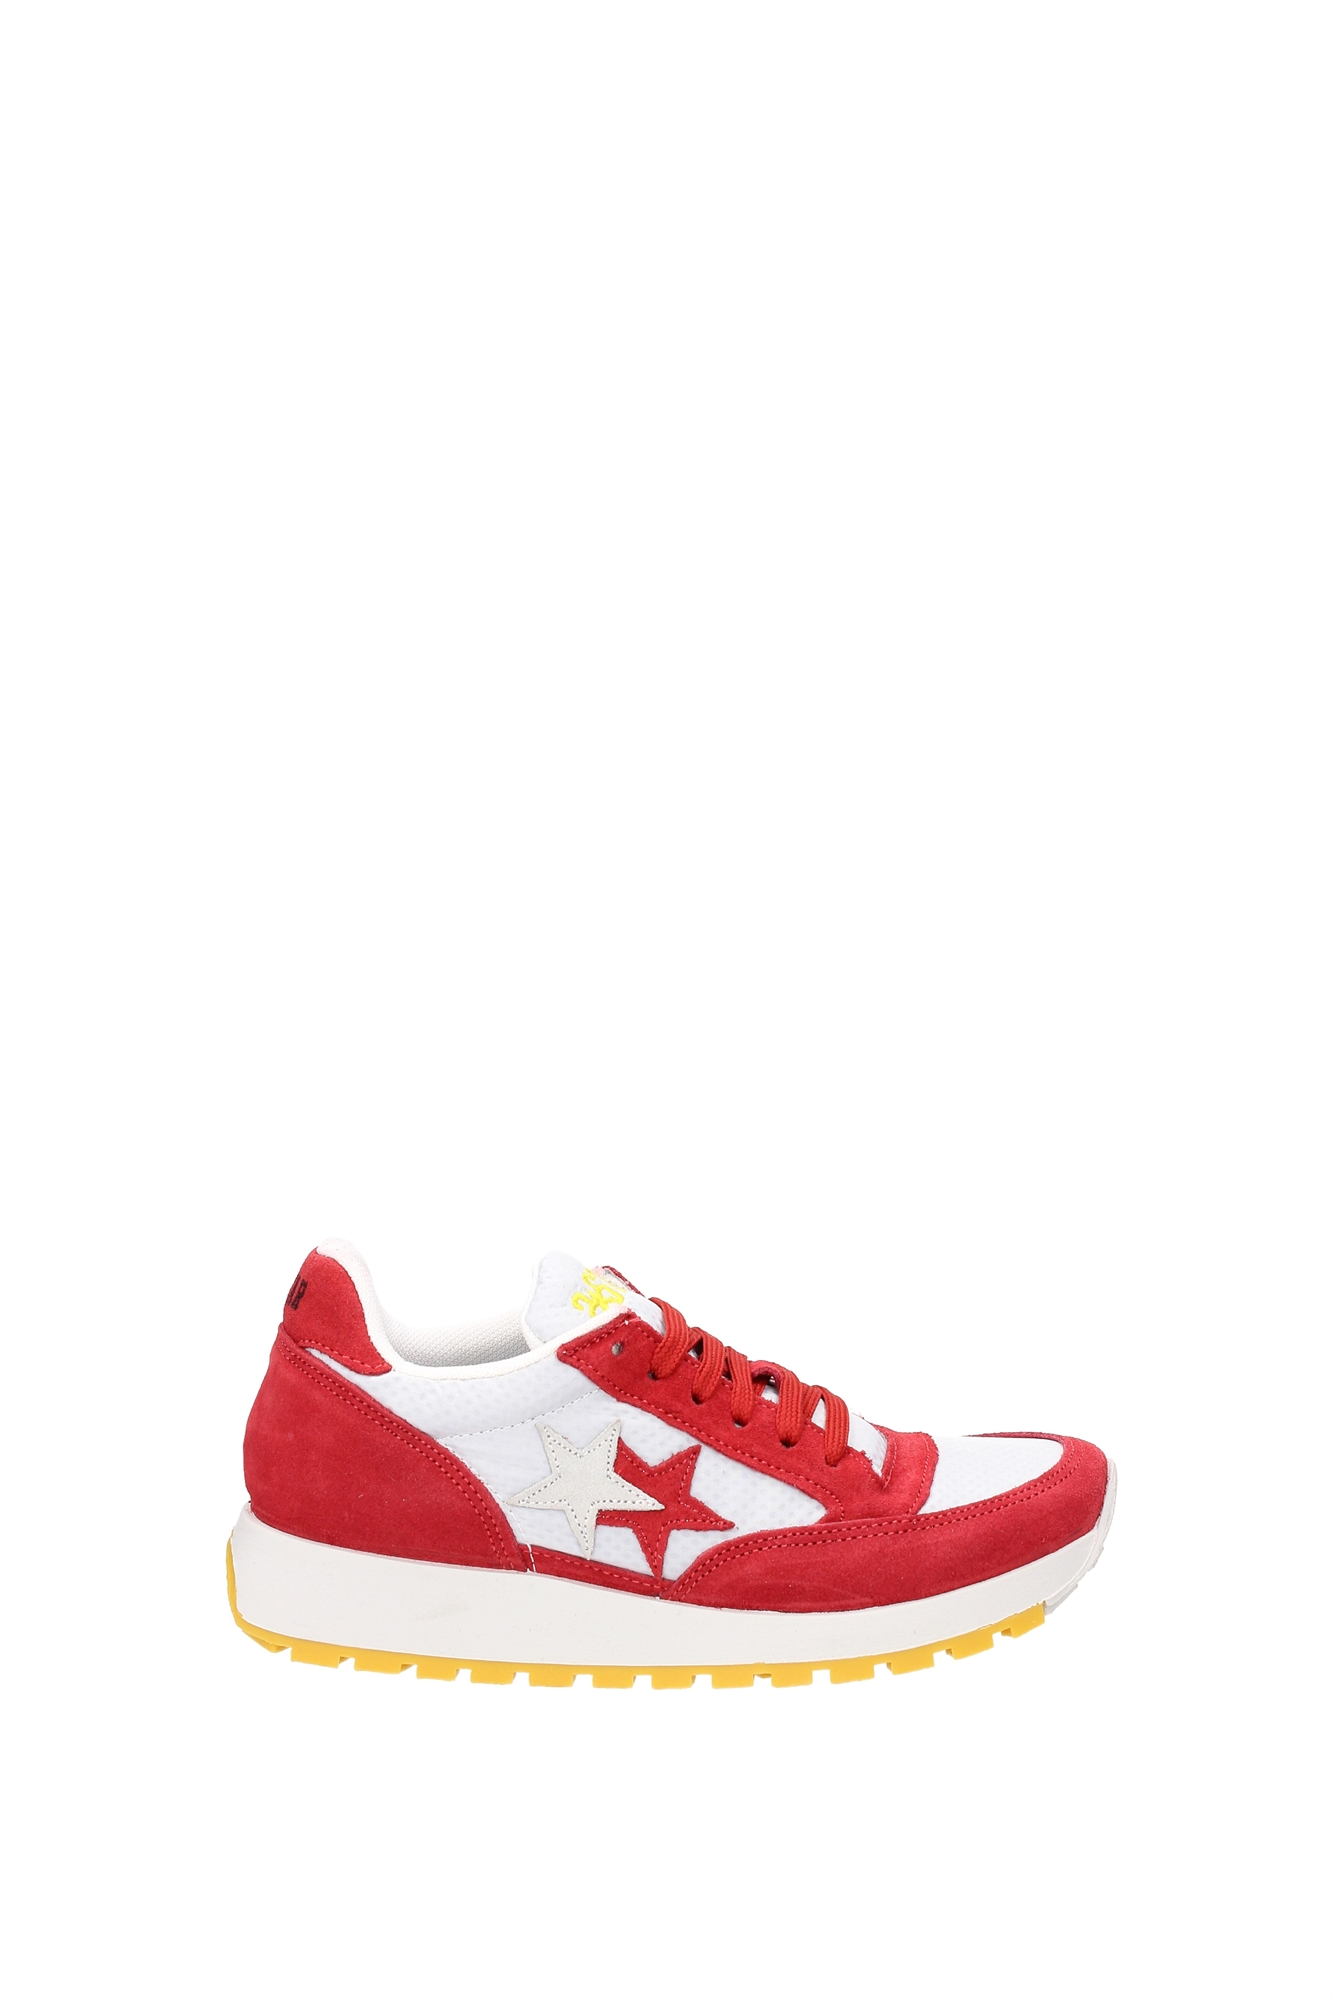 Sneakers 2star (2SD1147GHIACCIOAR) Damens - Suede (2SD1147GHIACCIOAR) 2star 866871